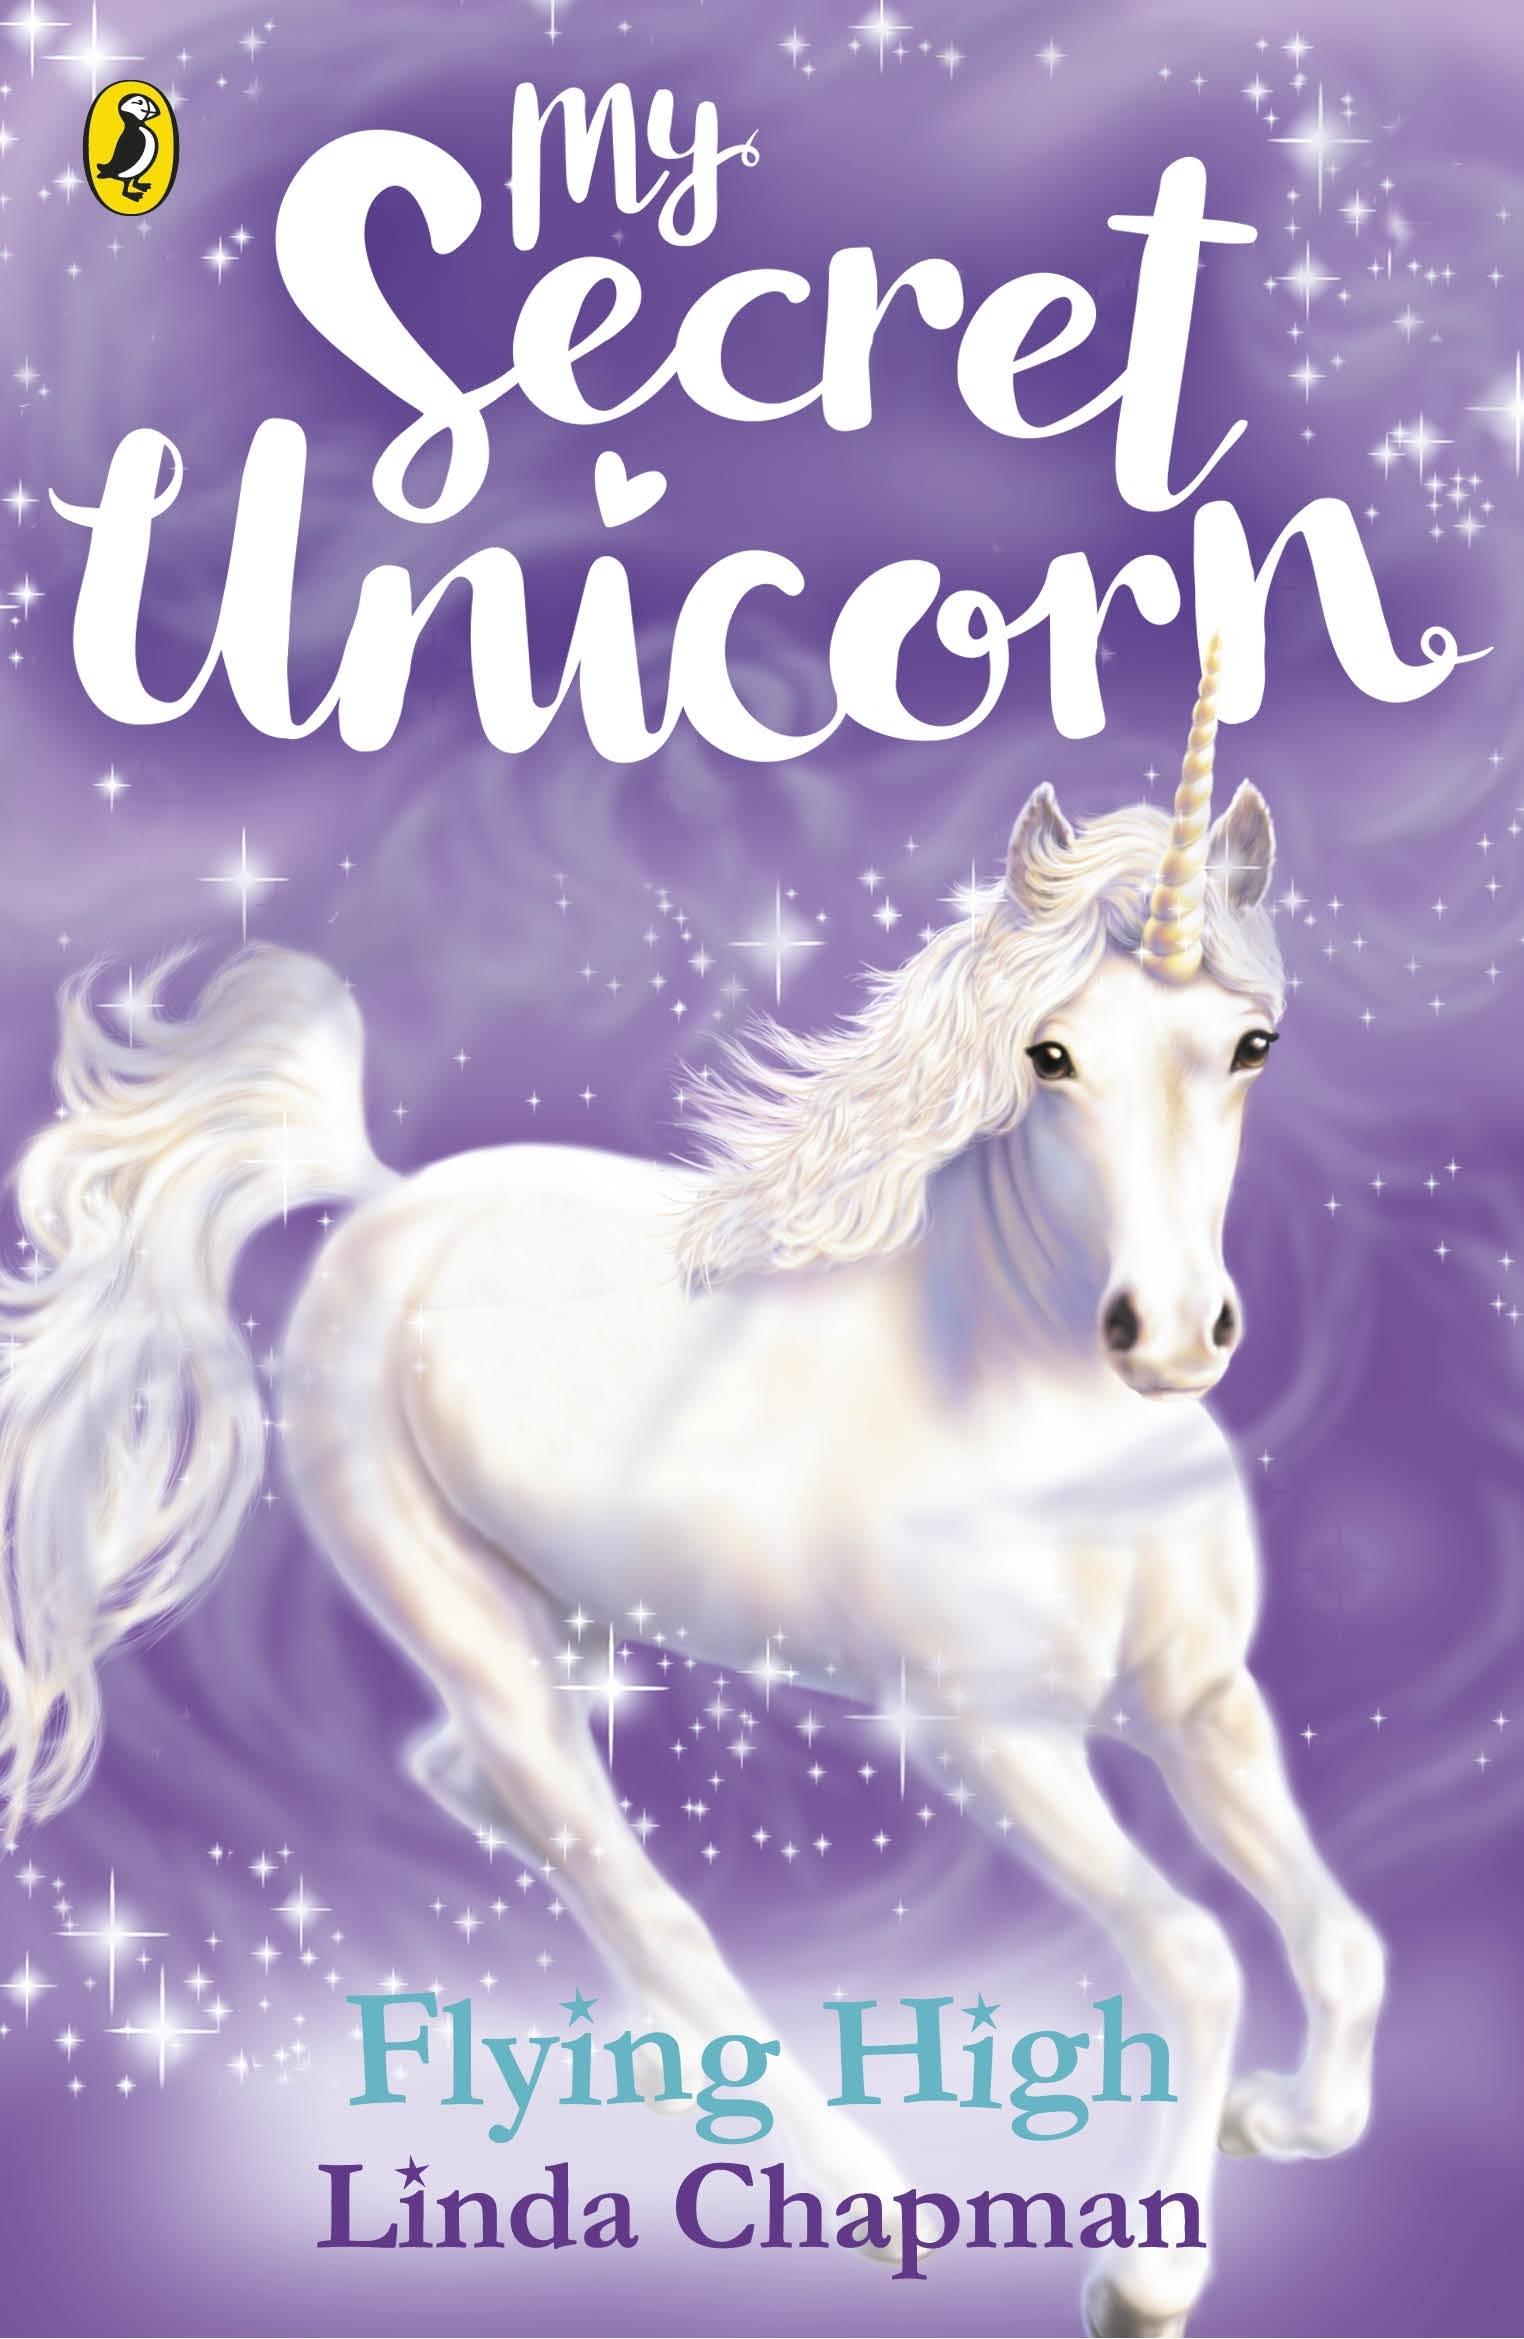 My Secret Unicorn: Flying High by Linda Chapman - Penguin